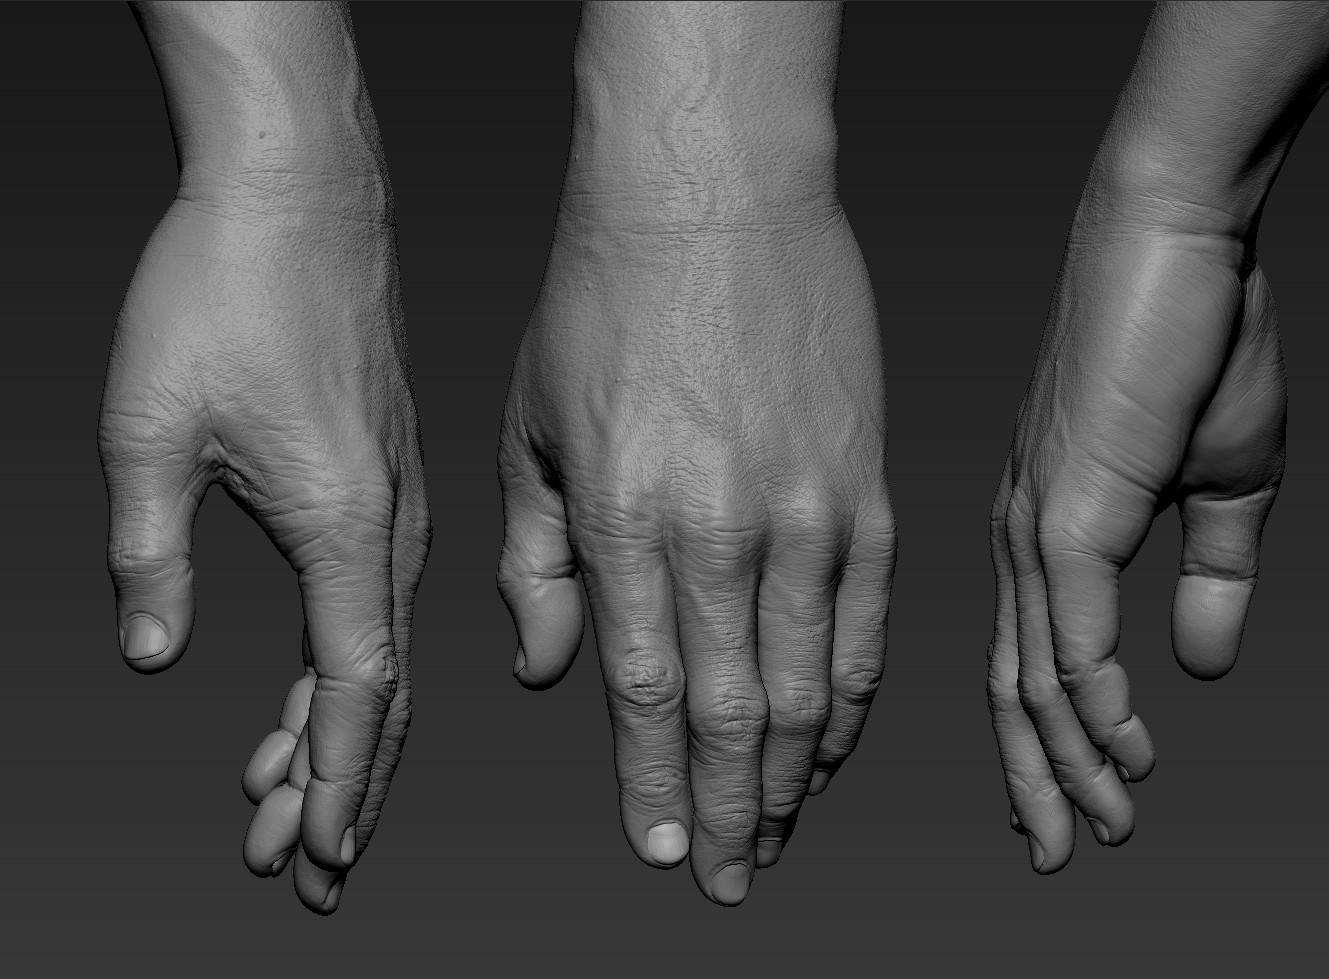 Andrey gritsuk hand 2